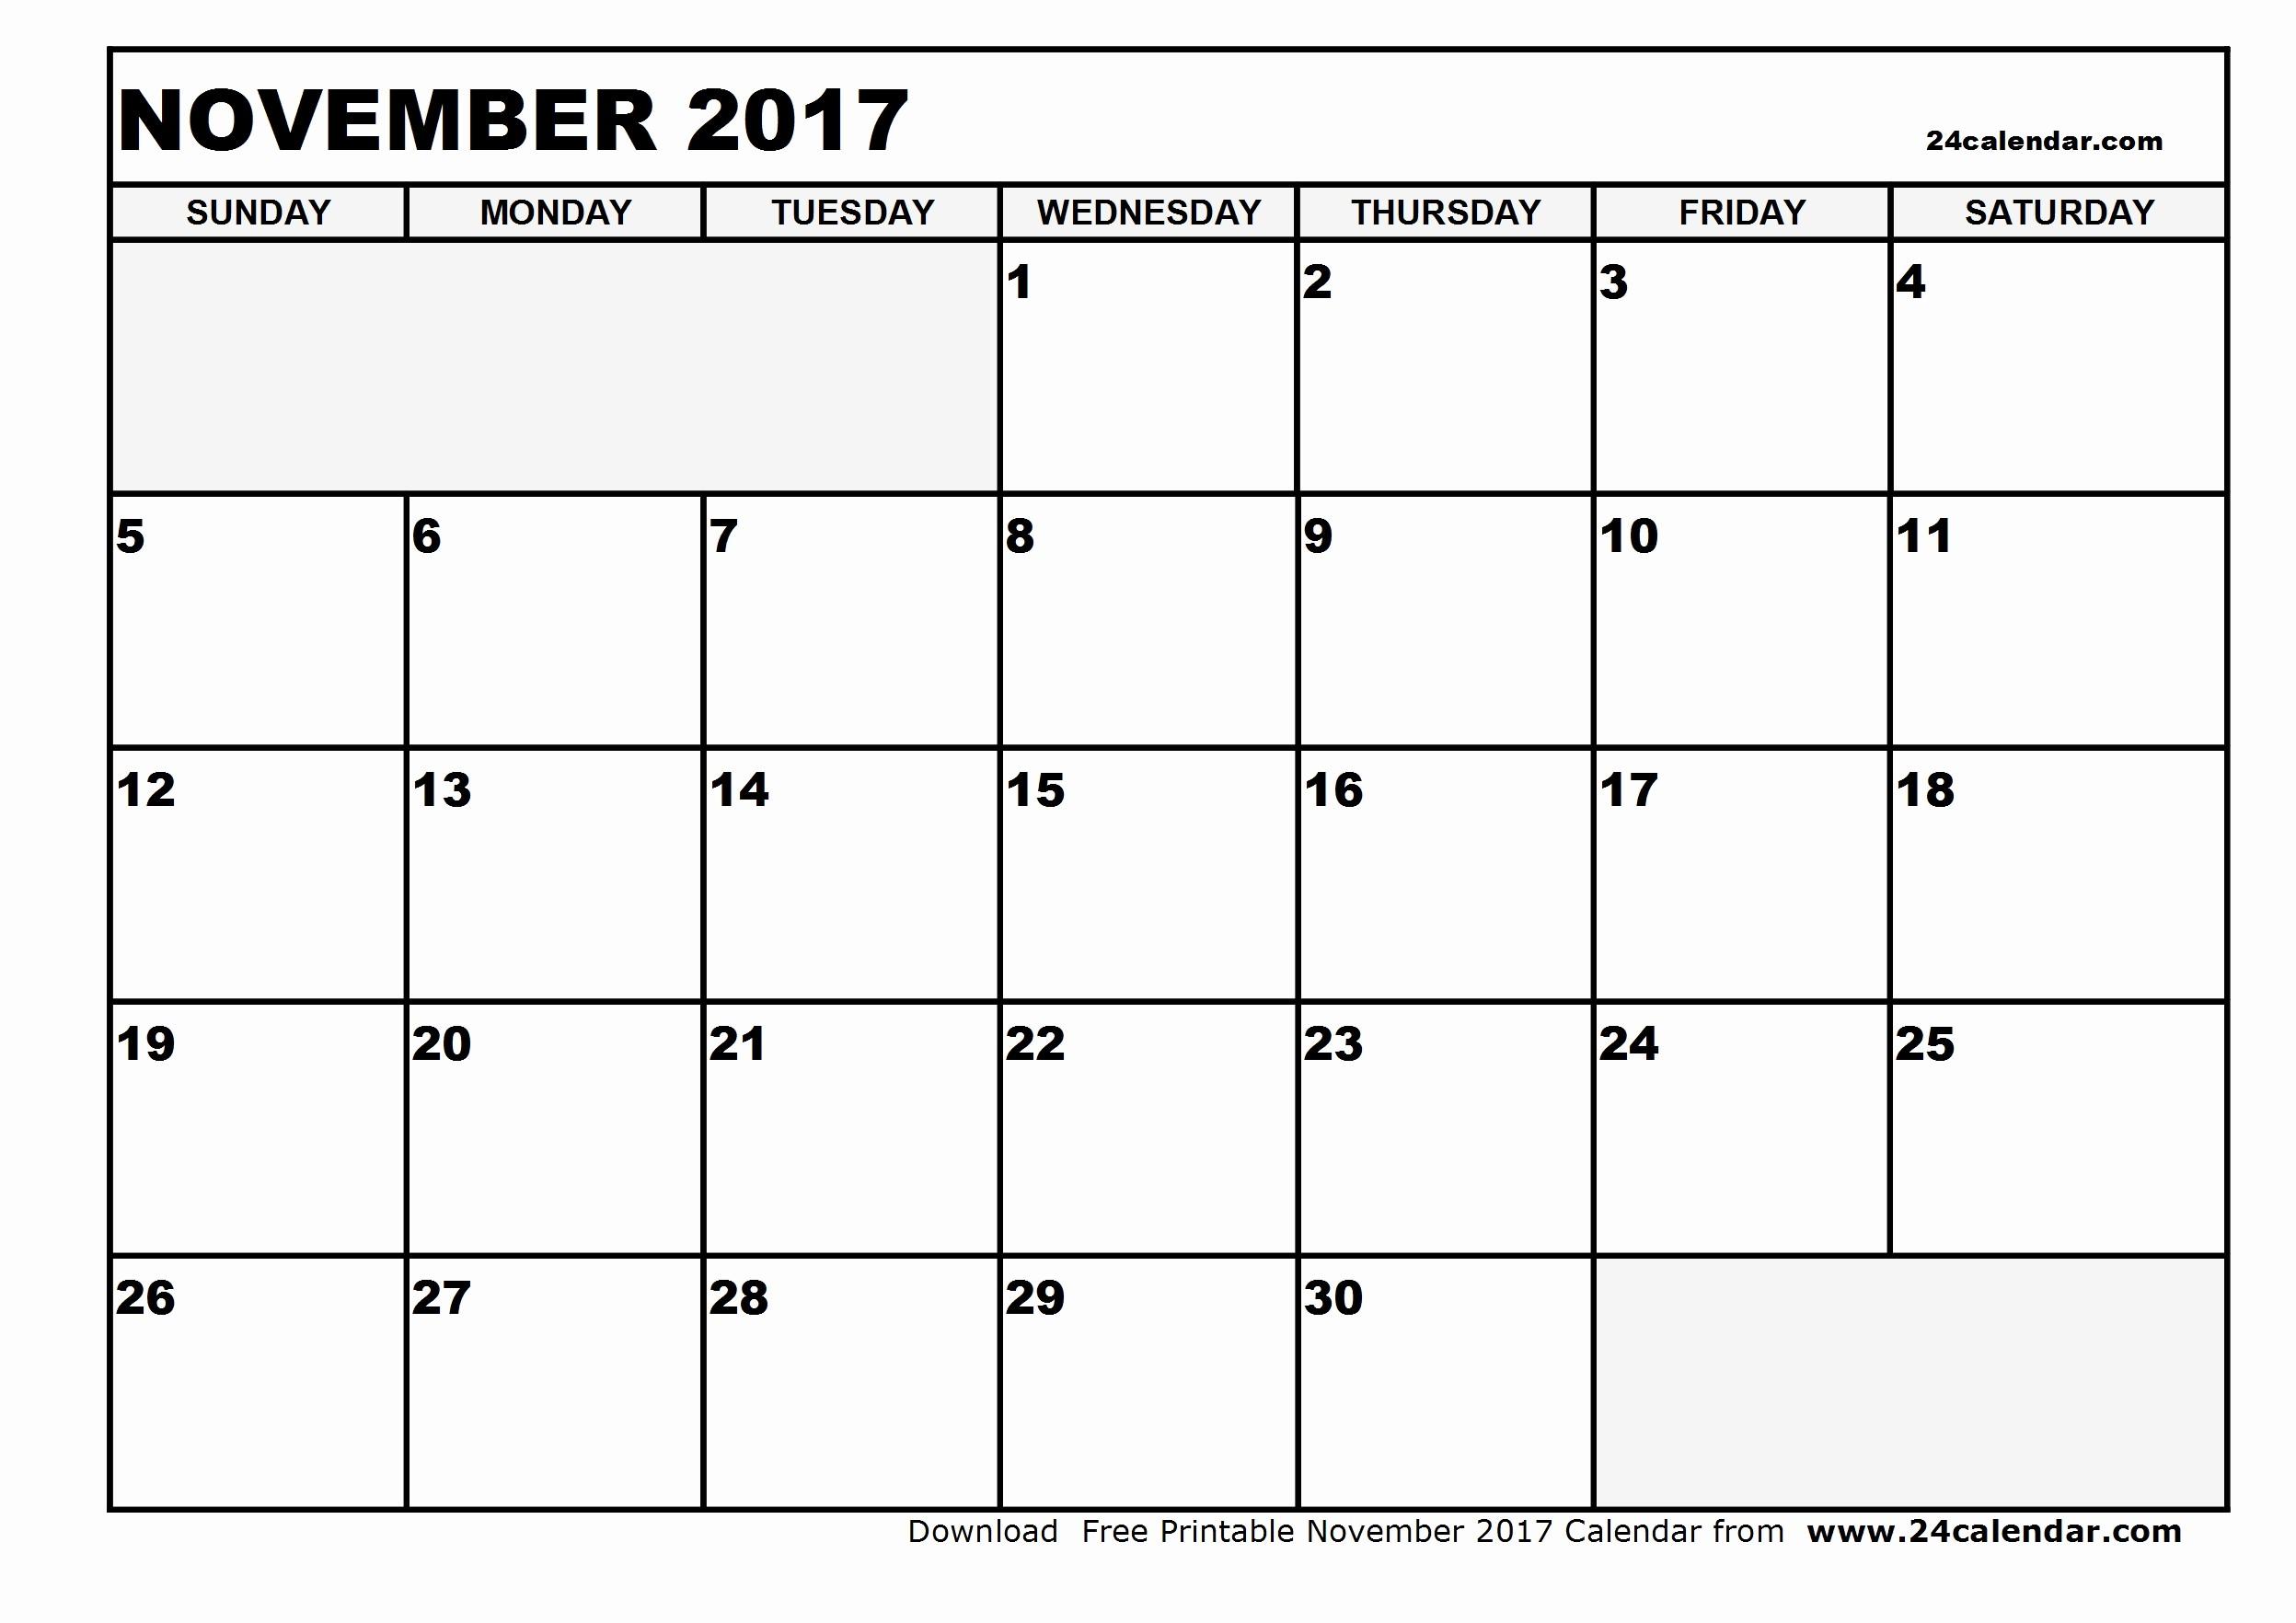 Blank November 2017 Calendar Template Unique Blank November 2017 Calendar In Printable format